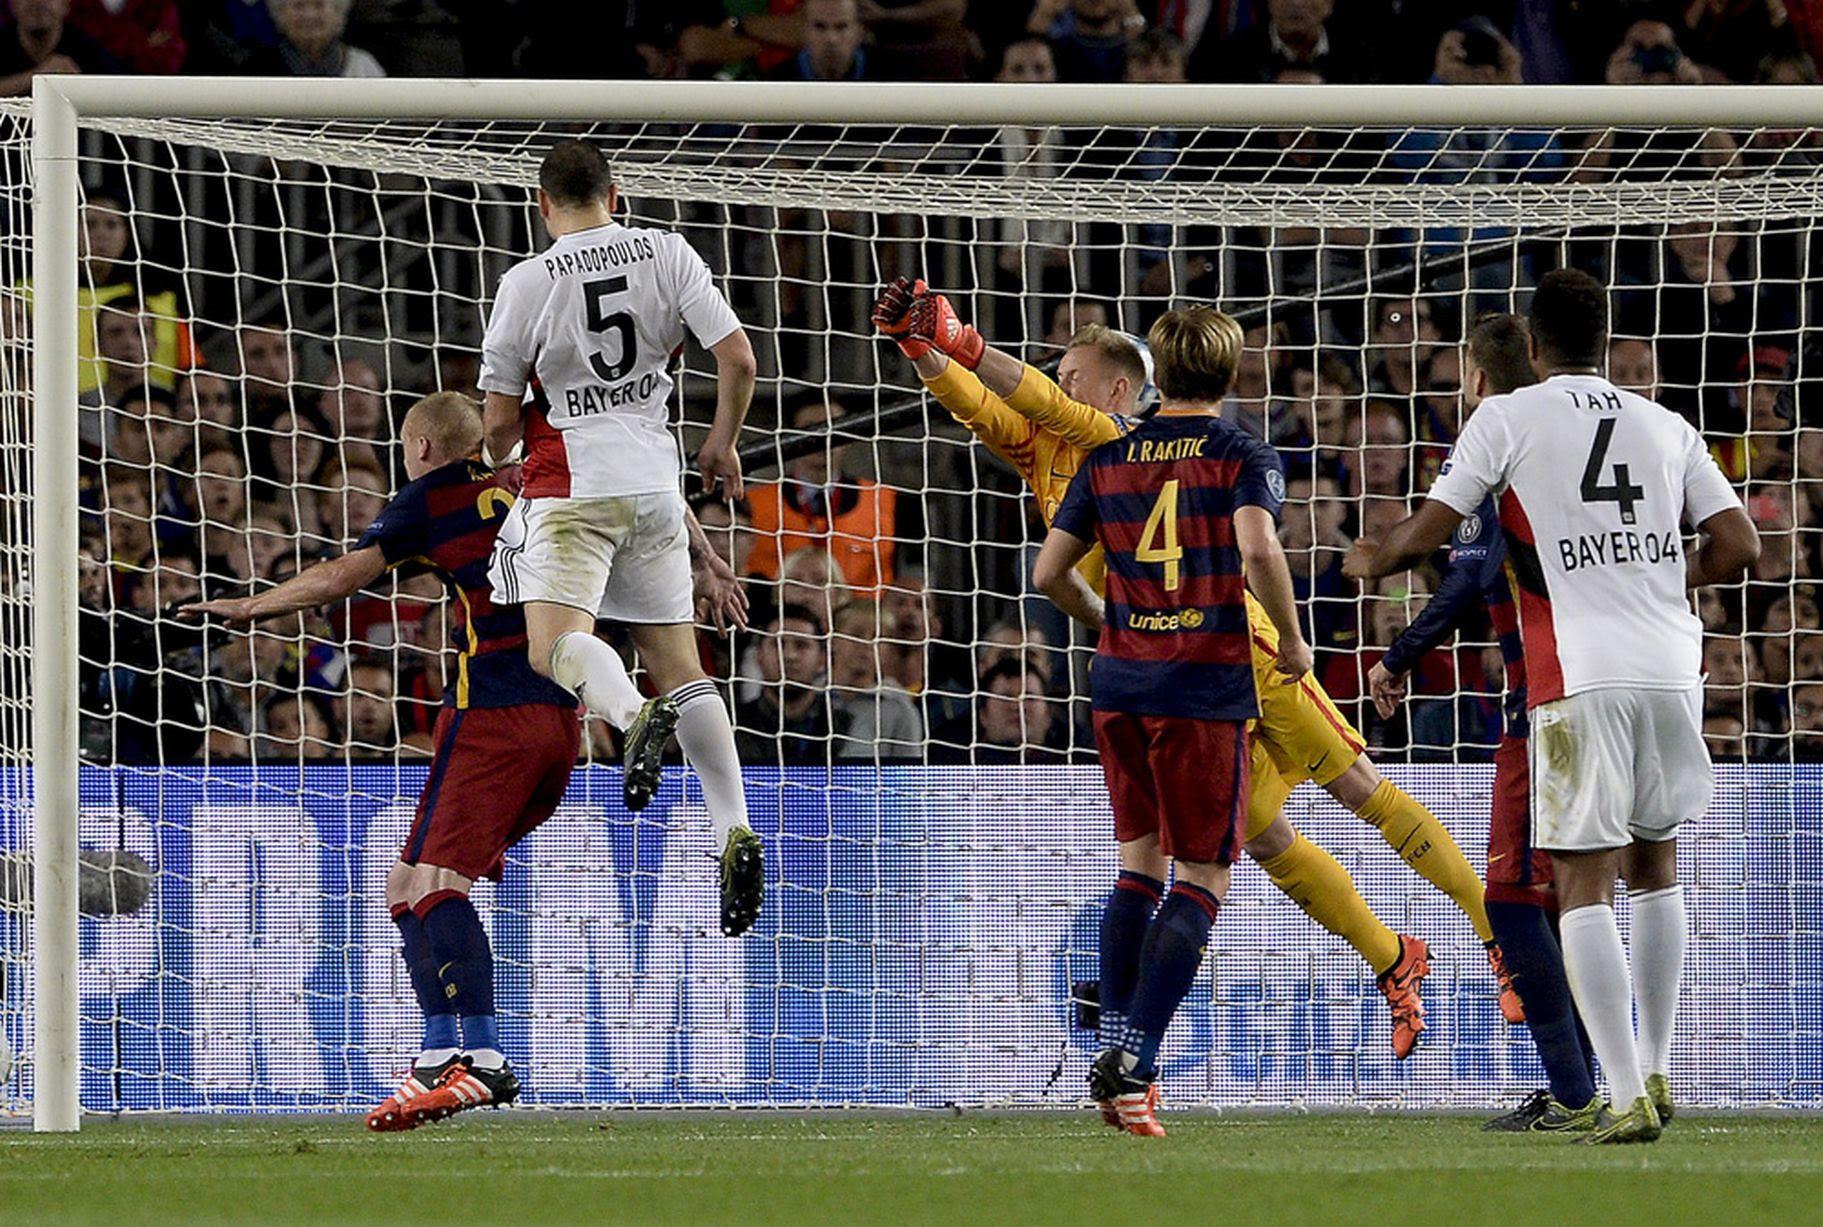 Bayer Leverkusen's Greek defender Kyriakos Papadopoulos heads the ball to score the first goal